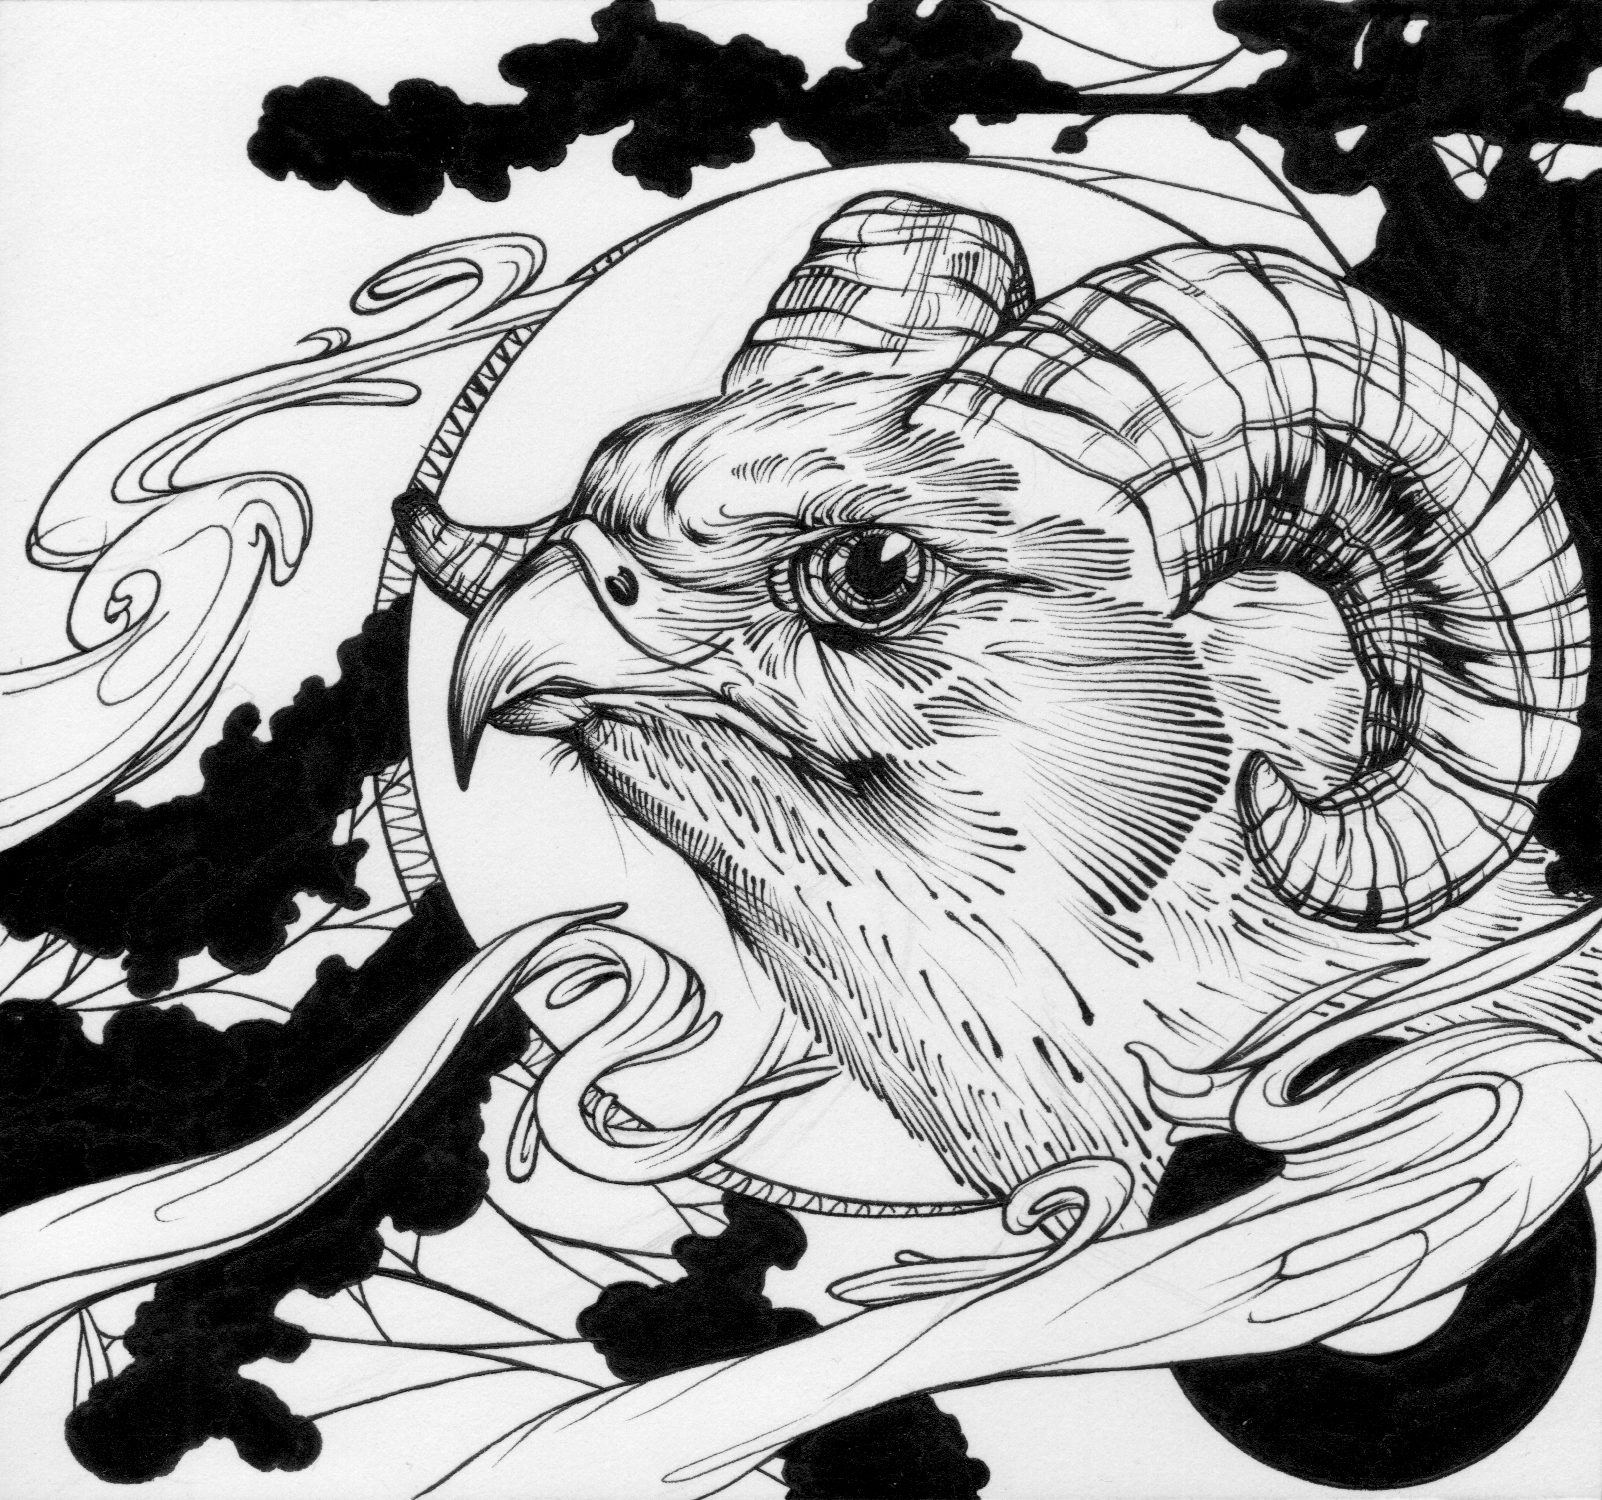 owlfacer - 1 (1).jpg